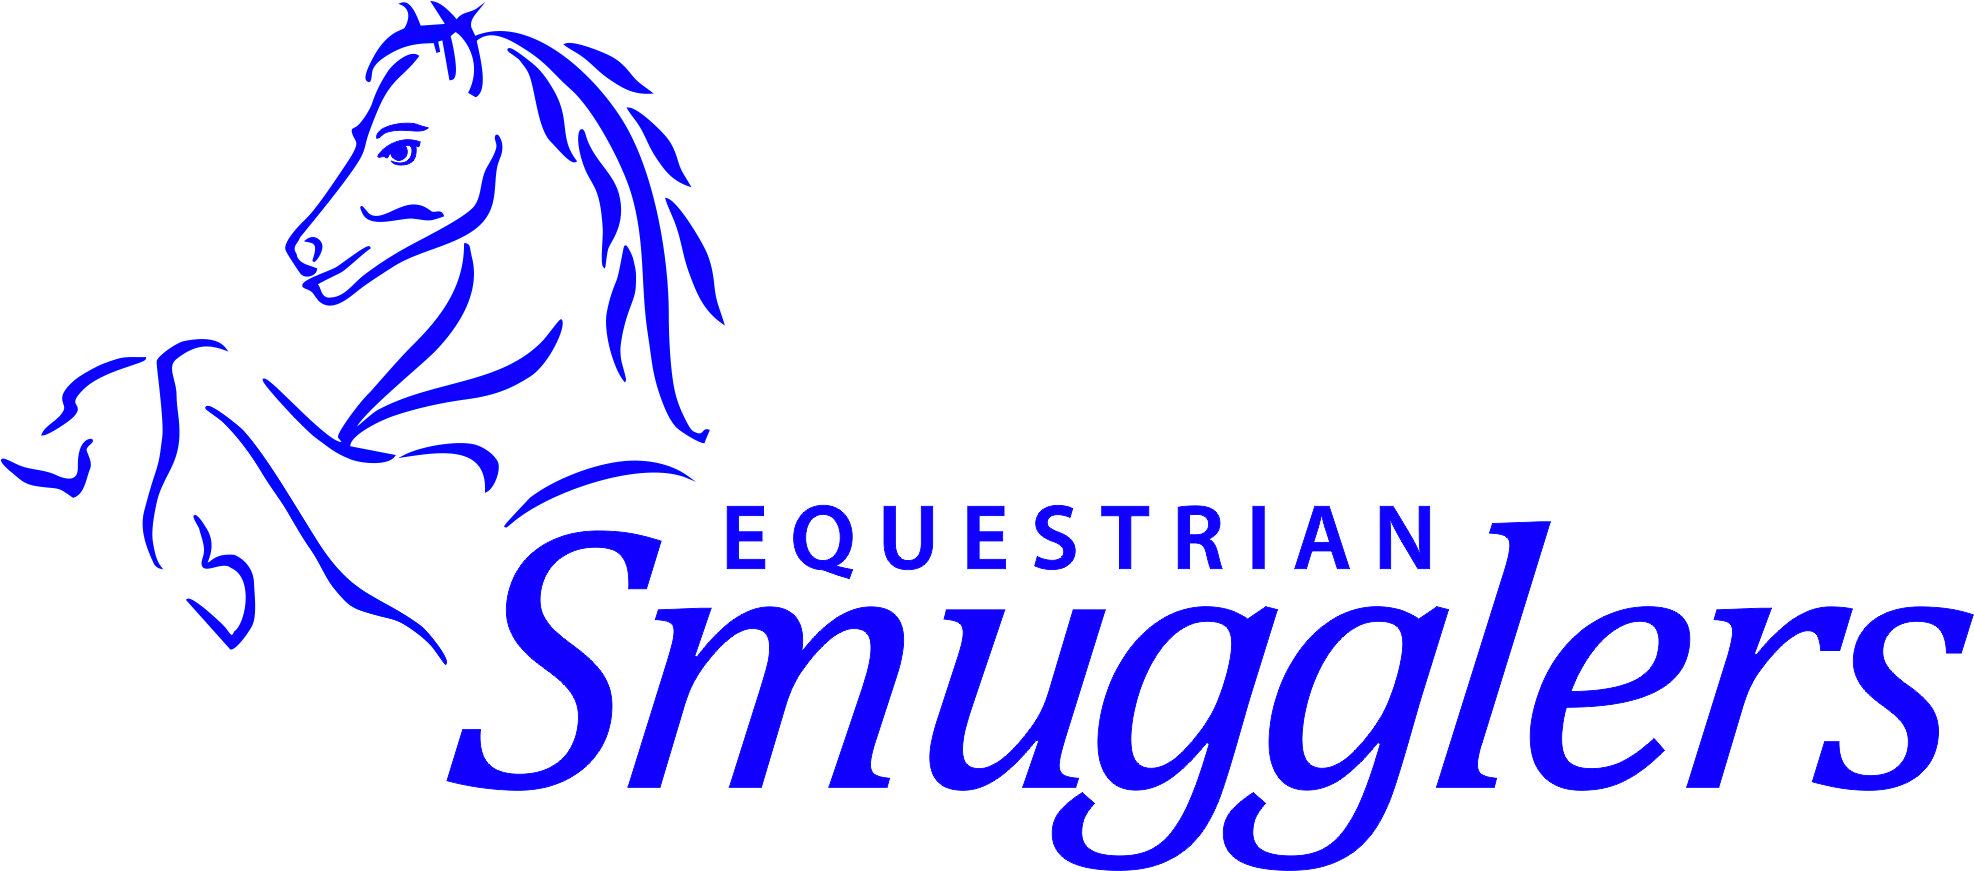 Smugglers Equestrian